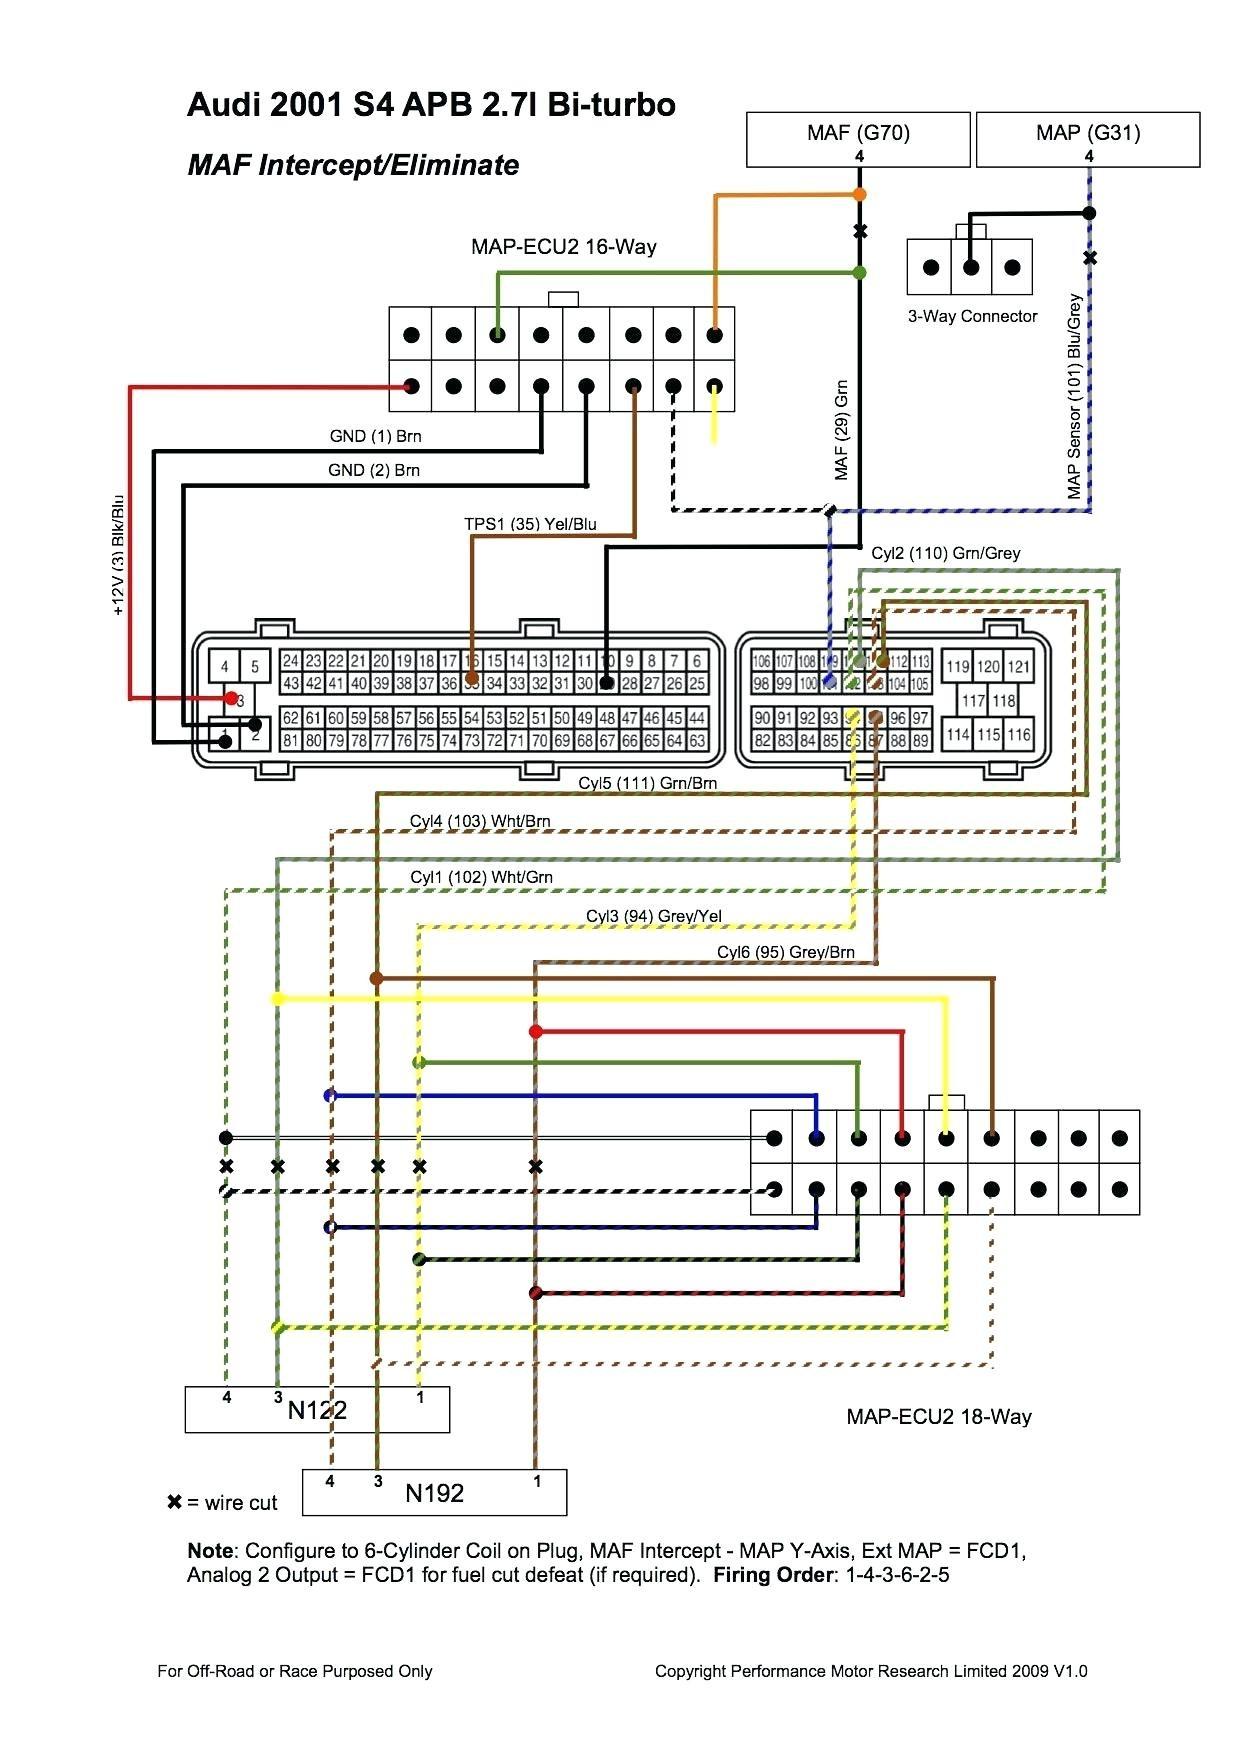 honda cb 900 wiring diagram on 2001 honda accord wiring diagram 12 4 pin cb mic wiring honda cb 900 wiring diagram on 2001 honda accord wiring diagram 12 rh boomerneur co